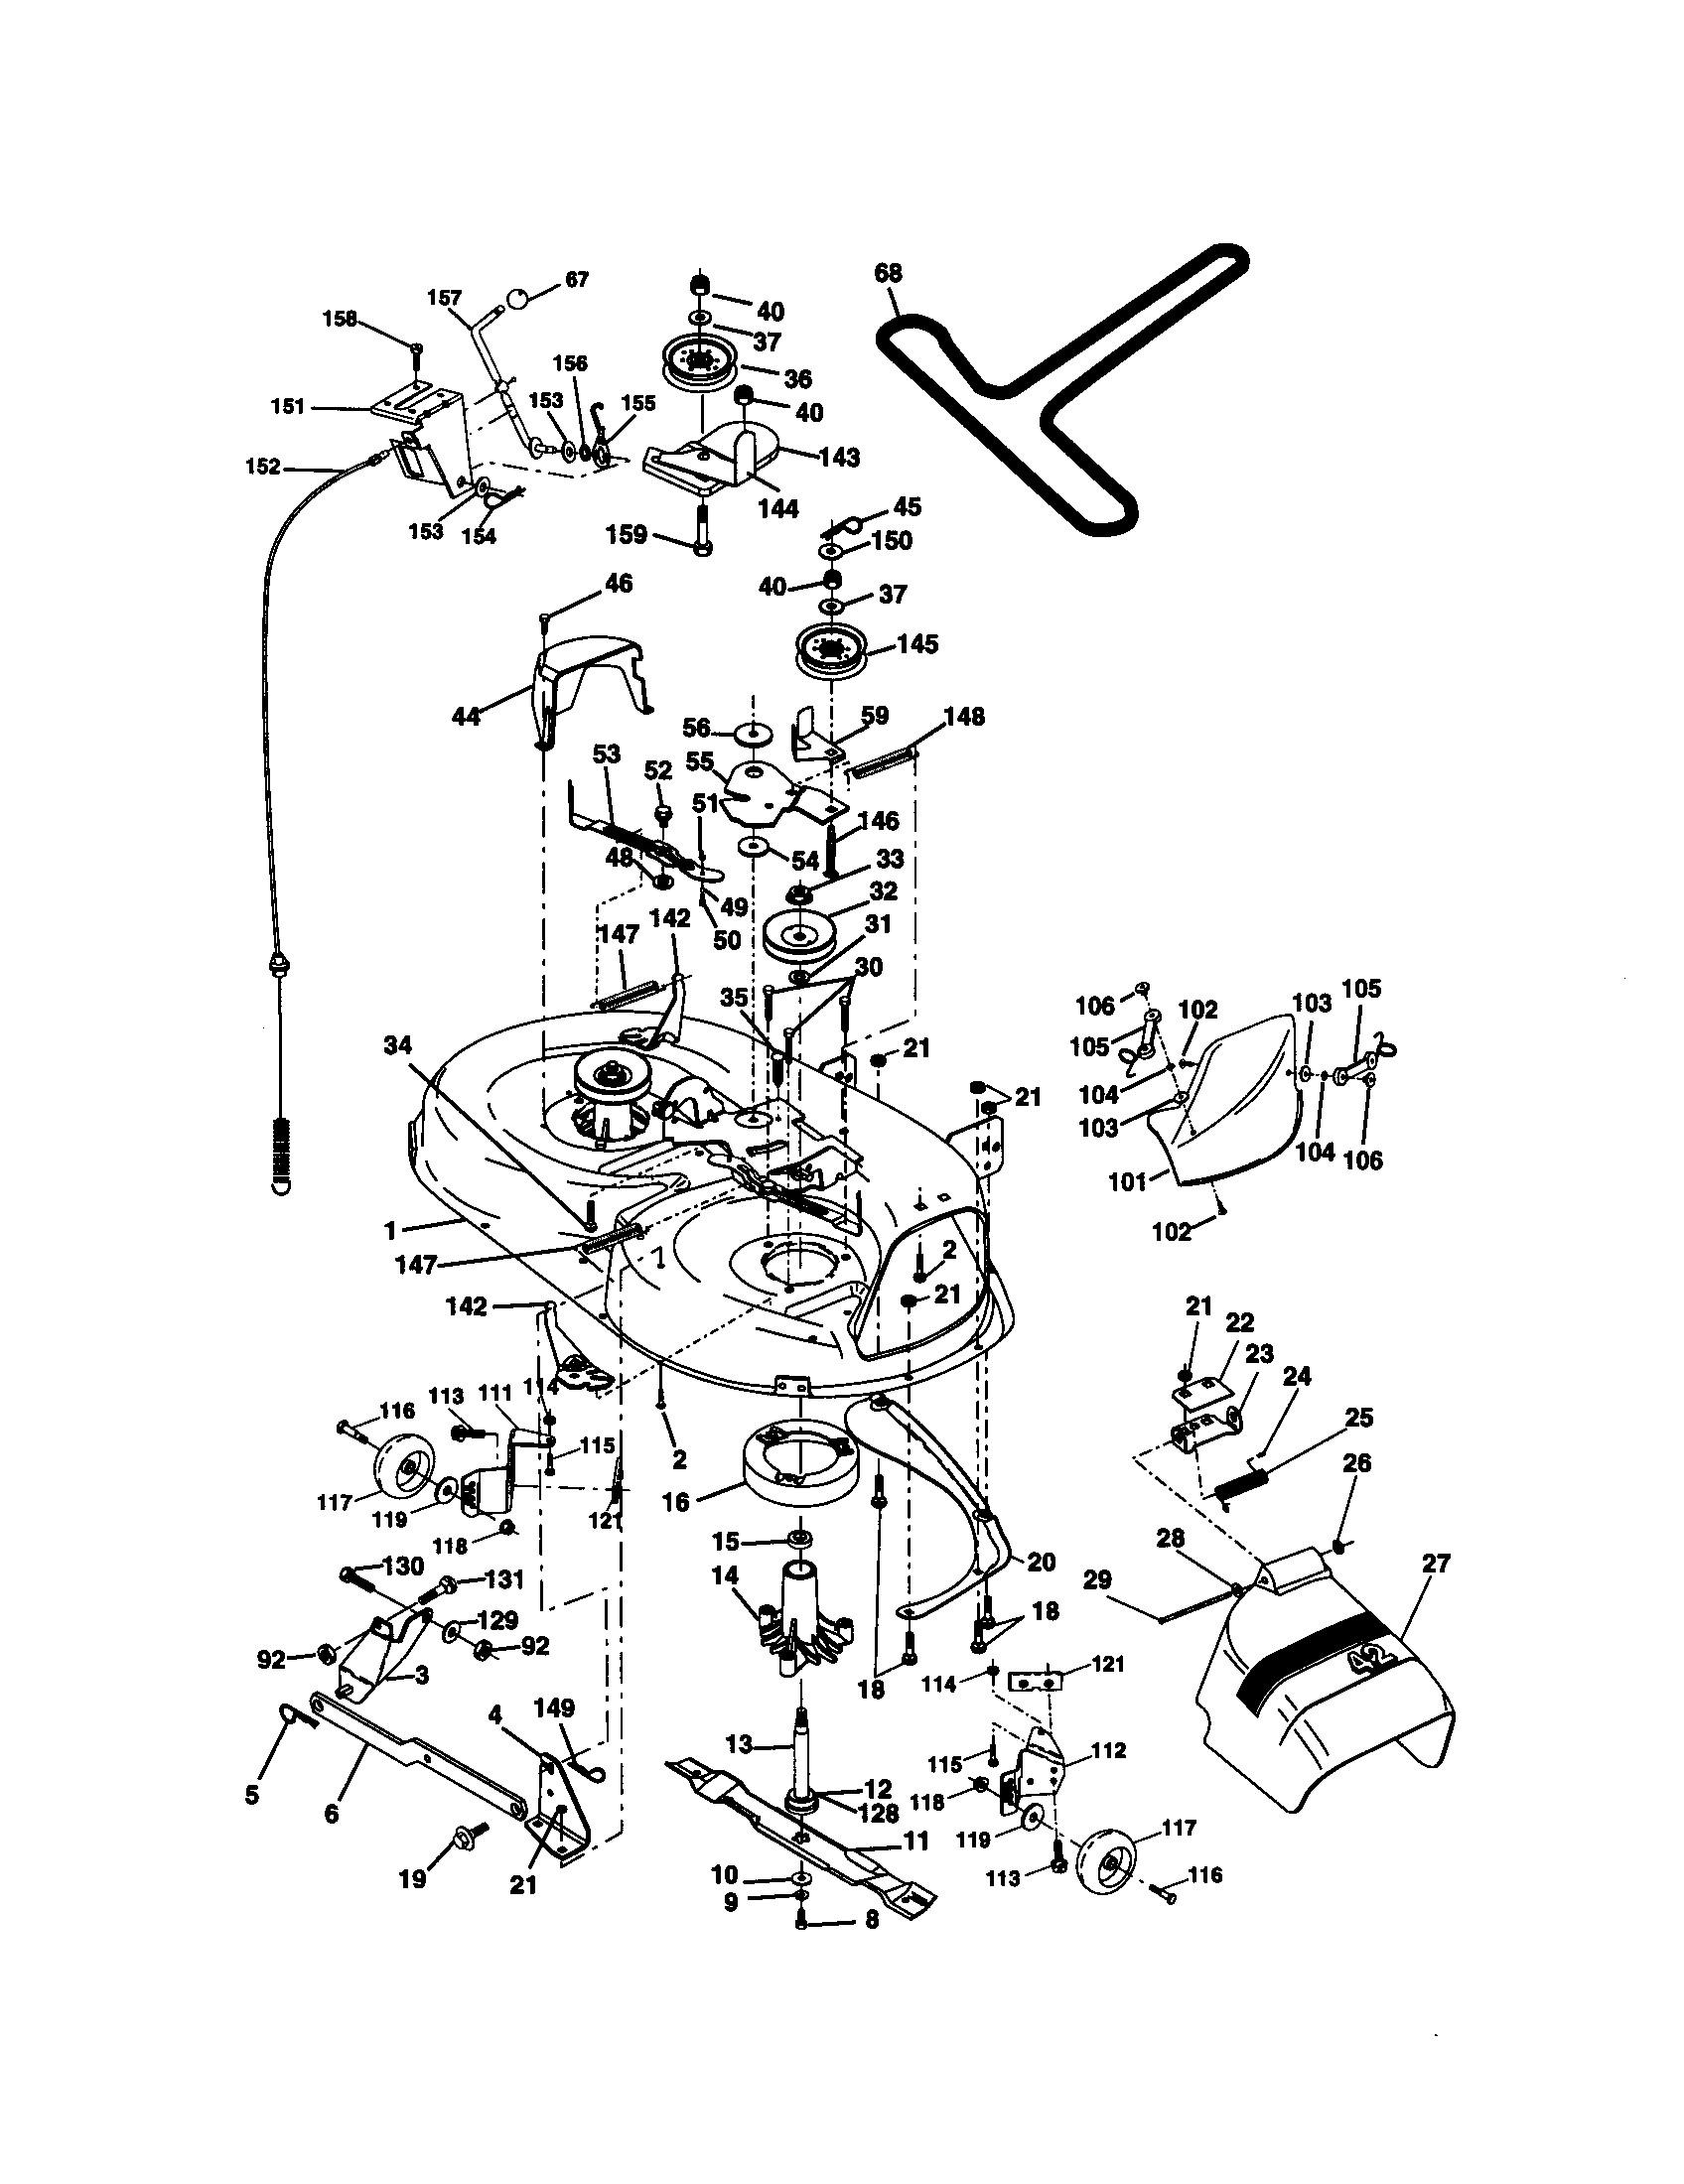 Briggs and Stratton 17 5 Hp Engine Diagram Craftsman Model Lawn Tractor Genuine Parts Of Briggs and Stratton 17 5 Hp Engine Diagram